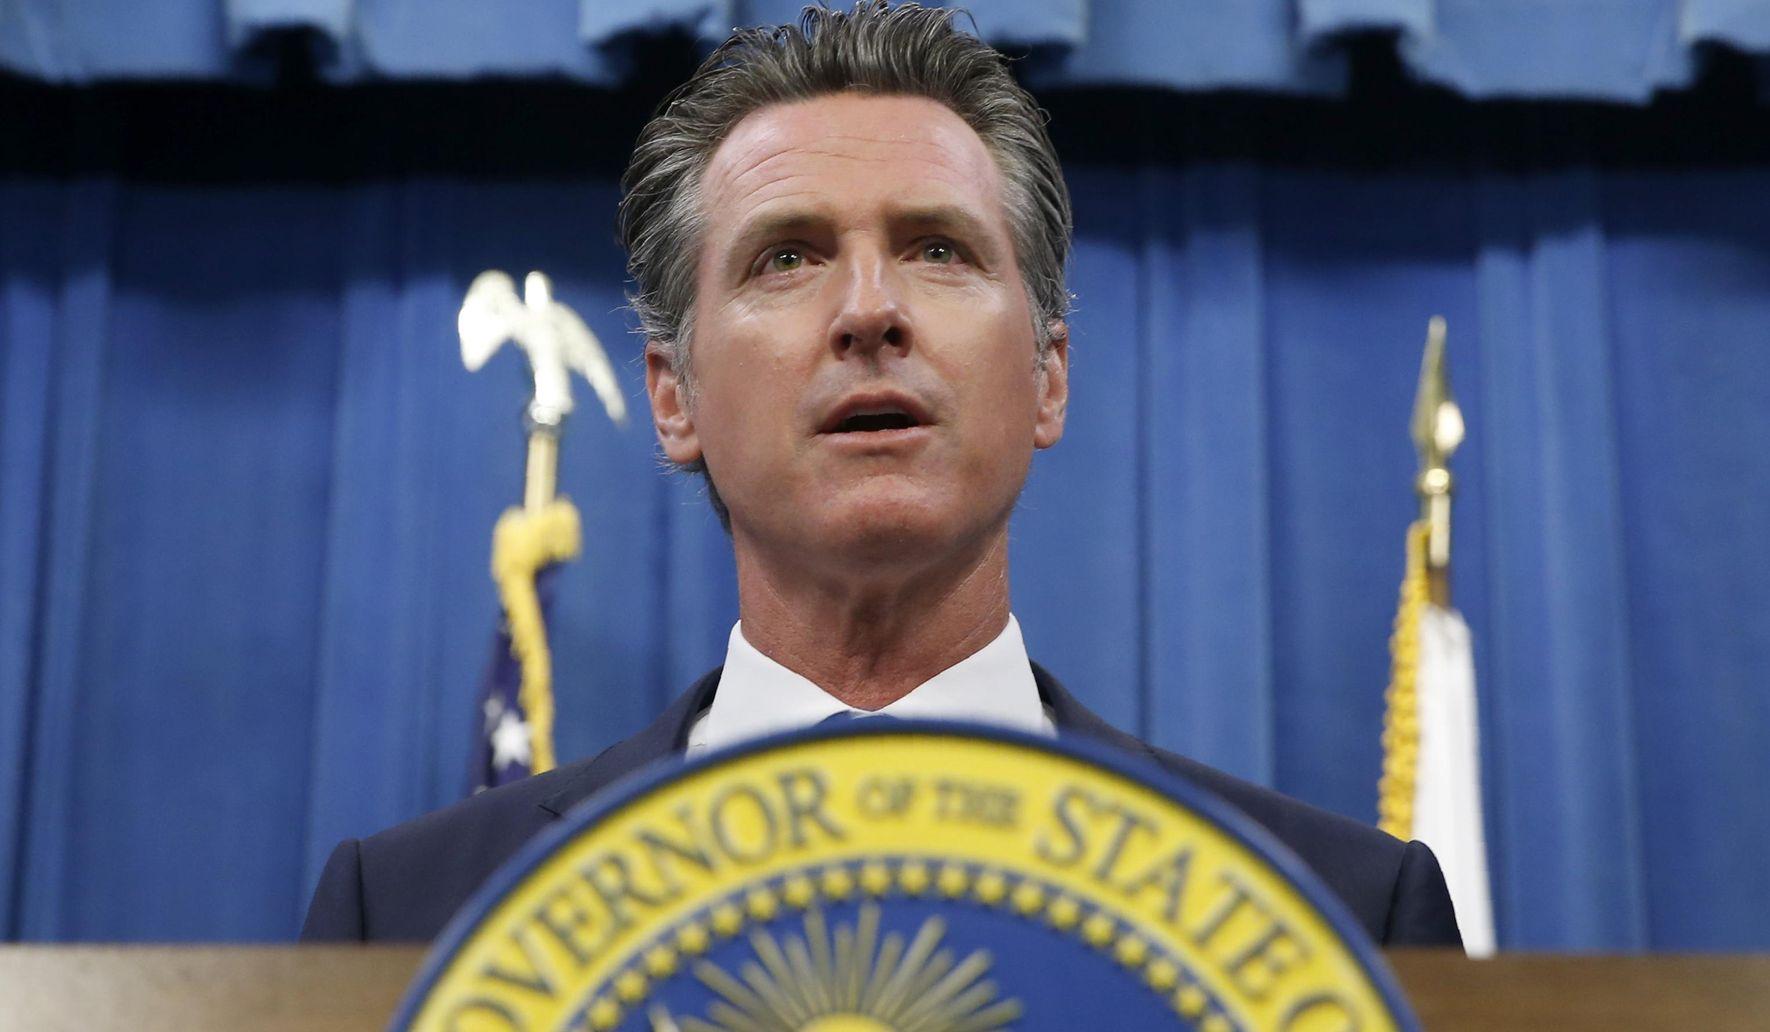 Gavin Newsom, California governor, to veto environmental bill